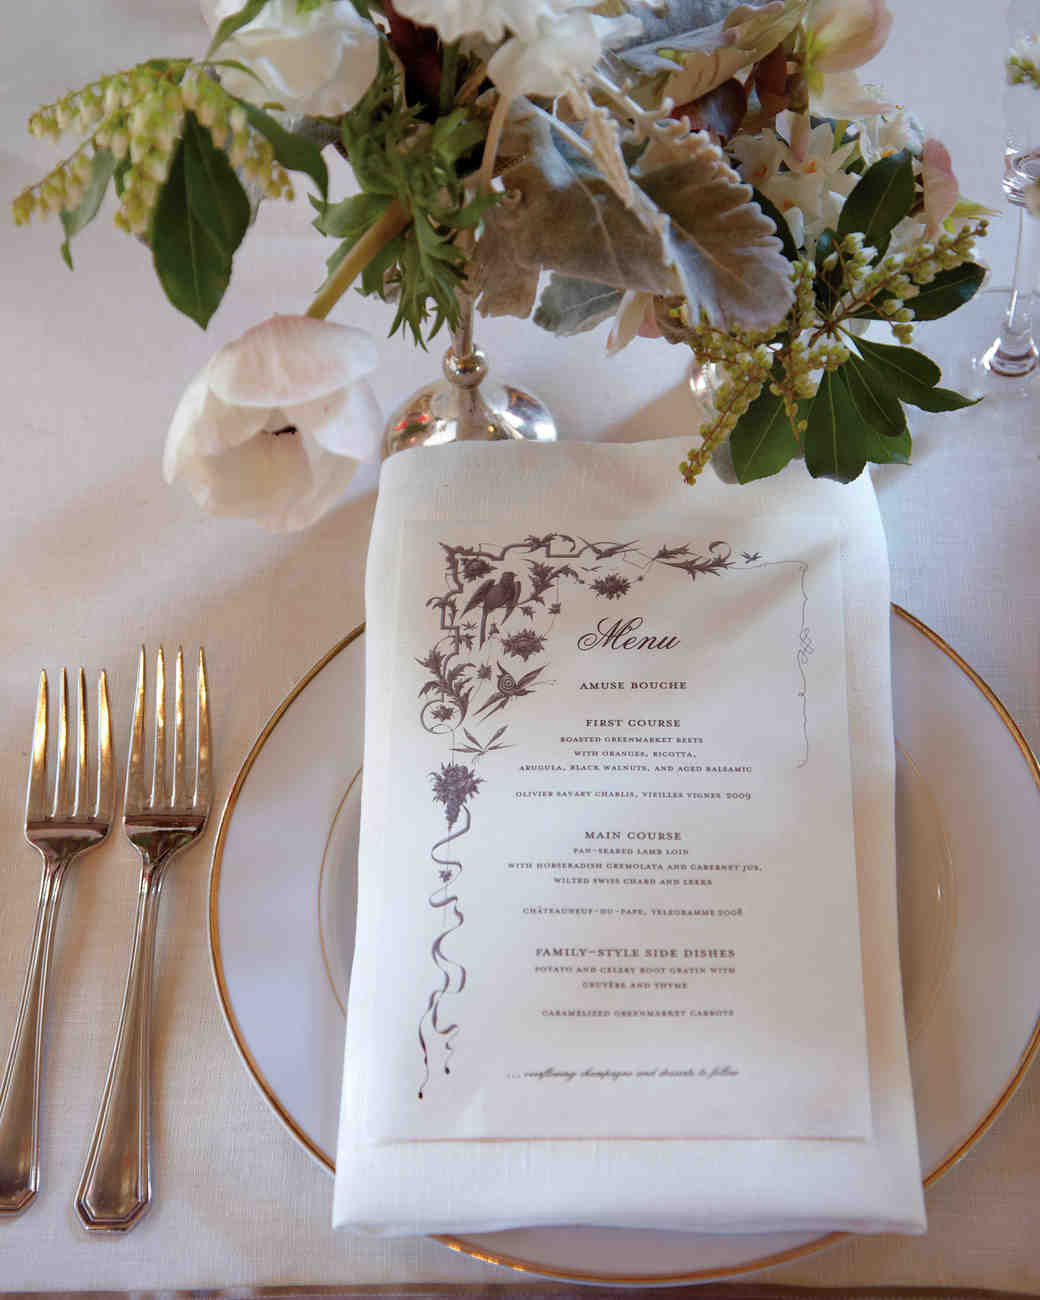 menu-0811mwd107282.jpg